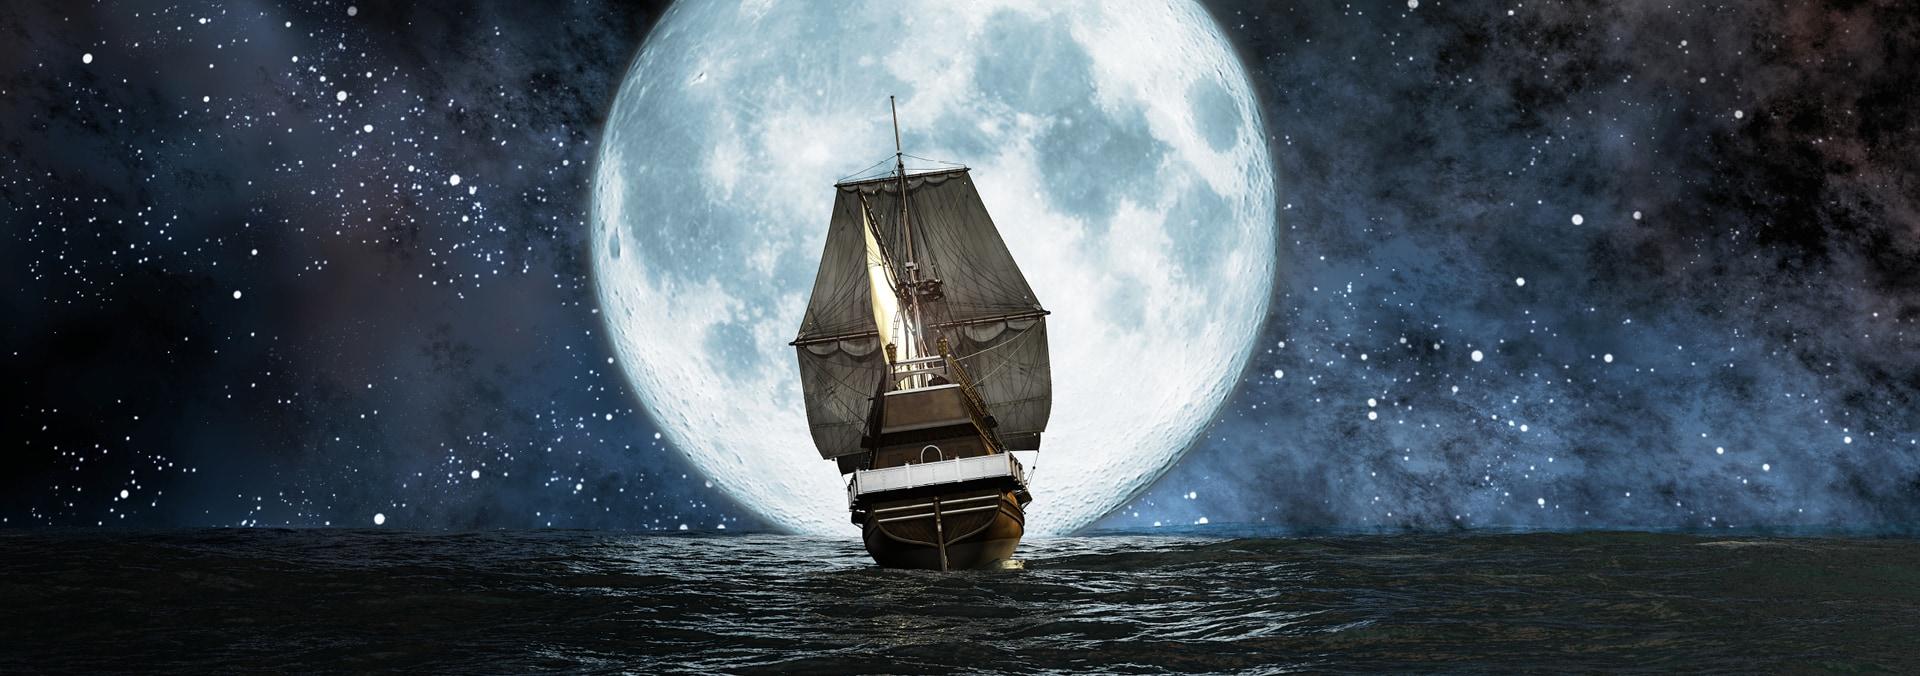 Nat på museet – Mysteriet om Døden på havet